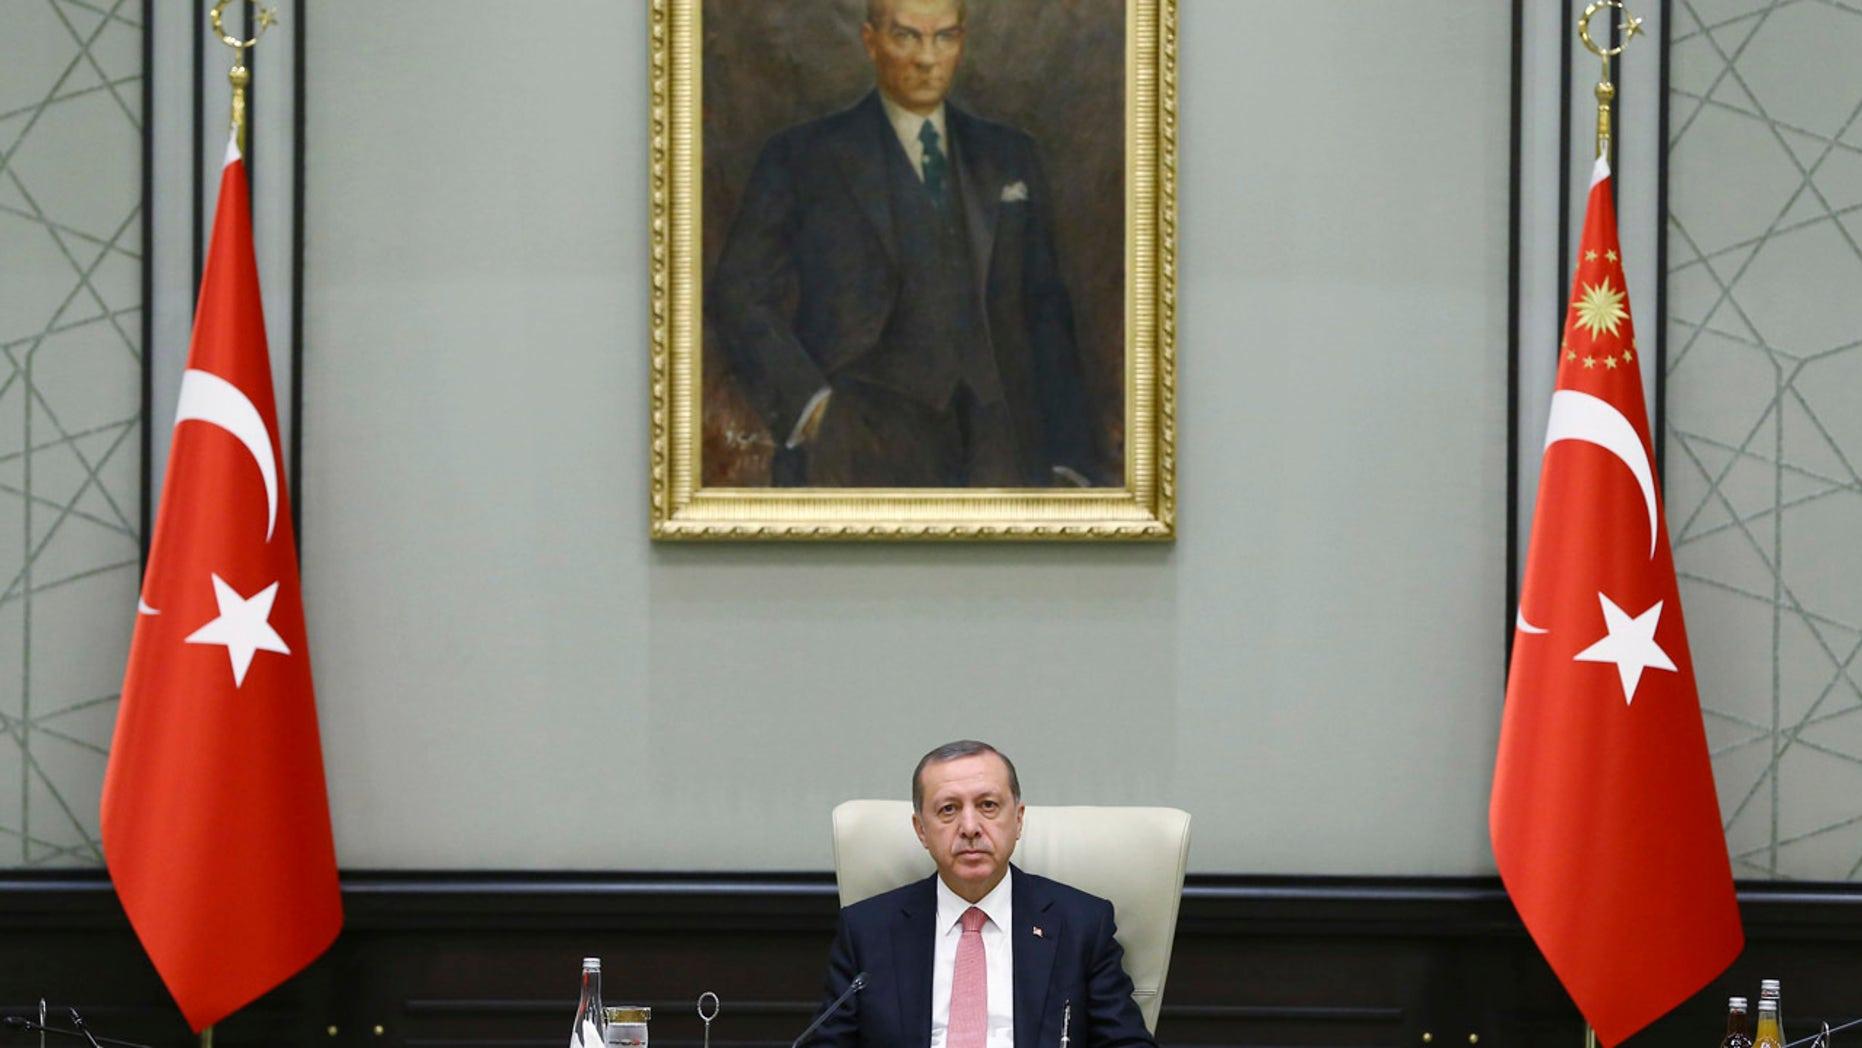 July 25, 2016: Under a portrait of Turkish Republic founder Mustafa Kemal Ataturk,Turkey's President Recep Tayyip Erdogan chairs a cabinet meeting